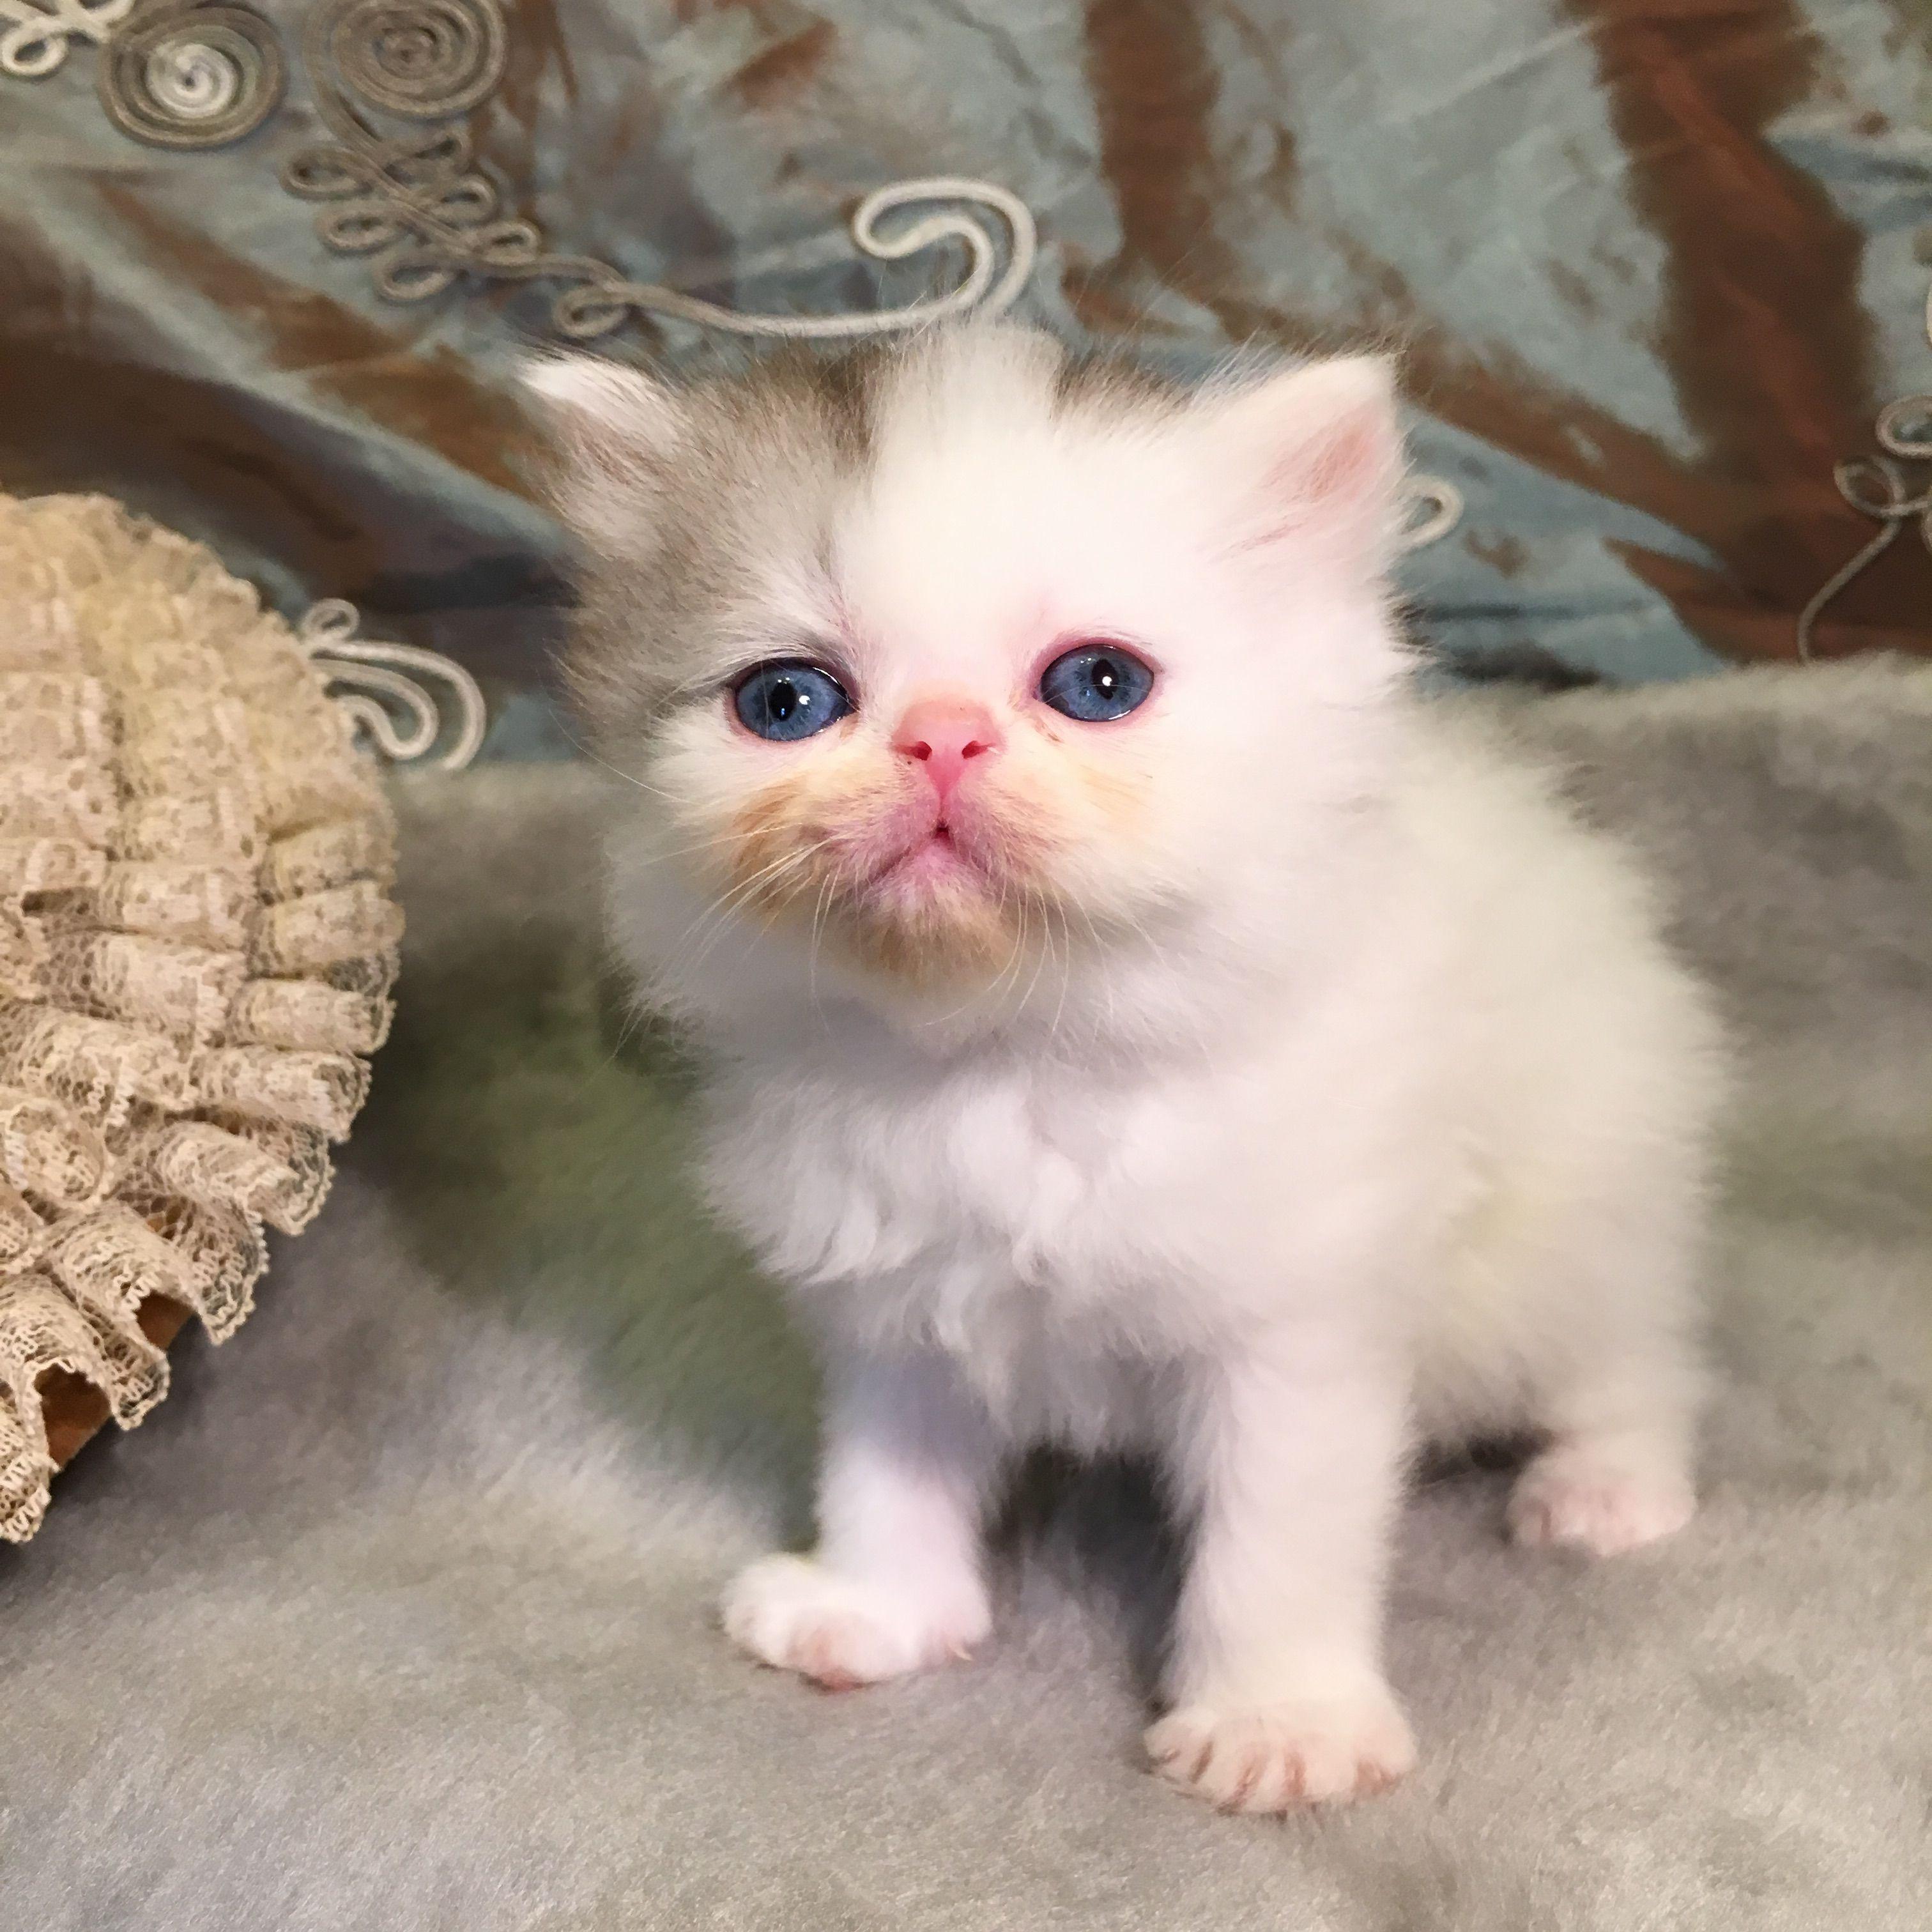 Gelato a smoke bicolor non standard Napoleon Minuet girl kitten